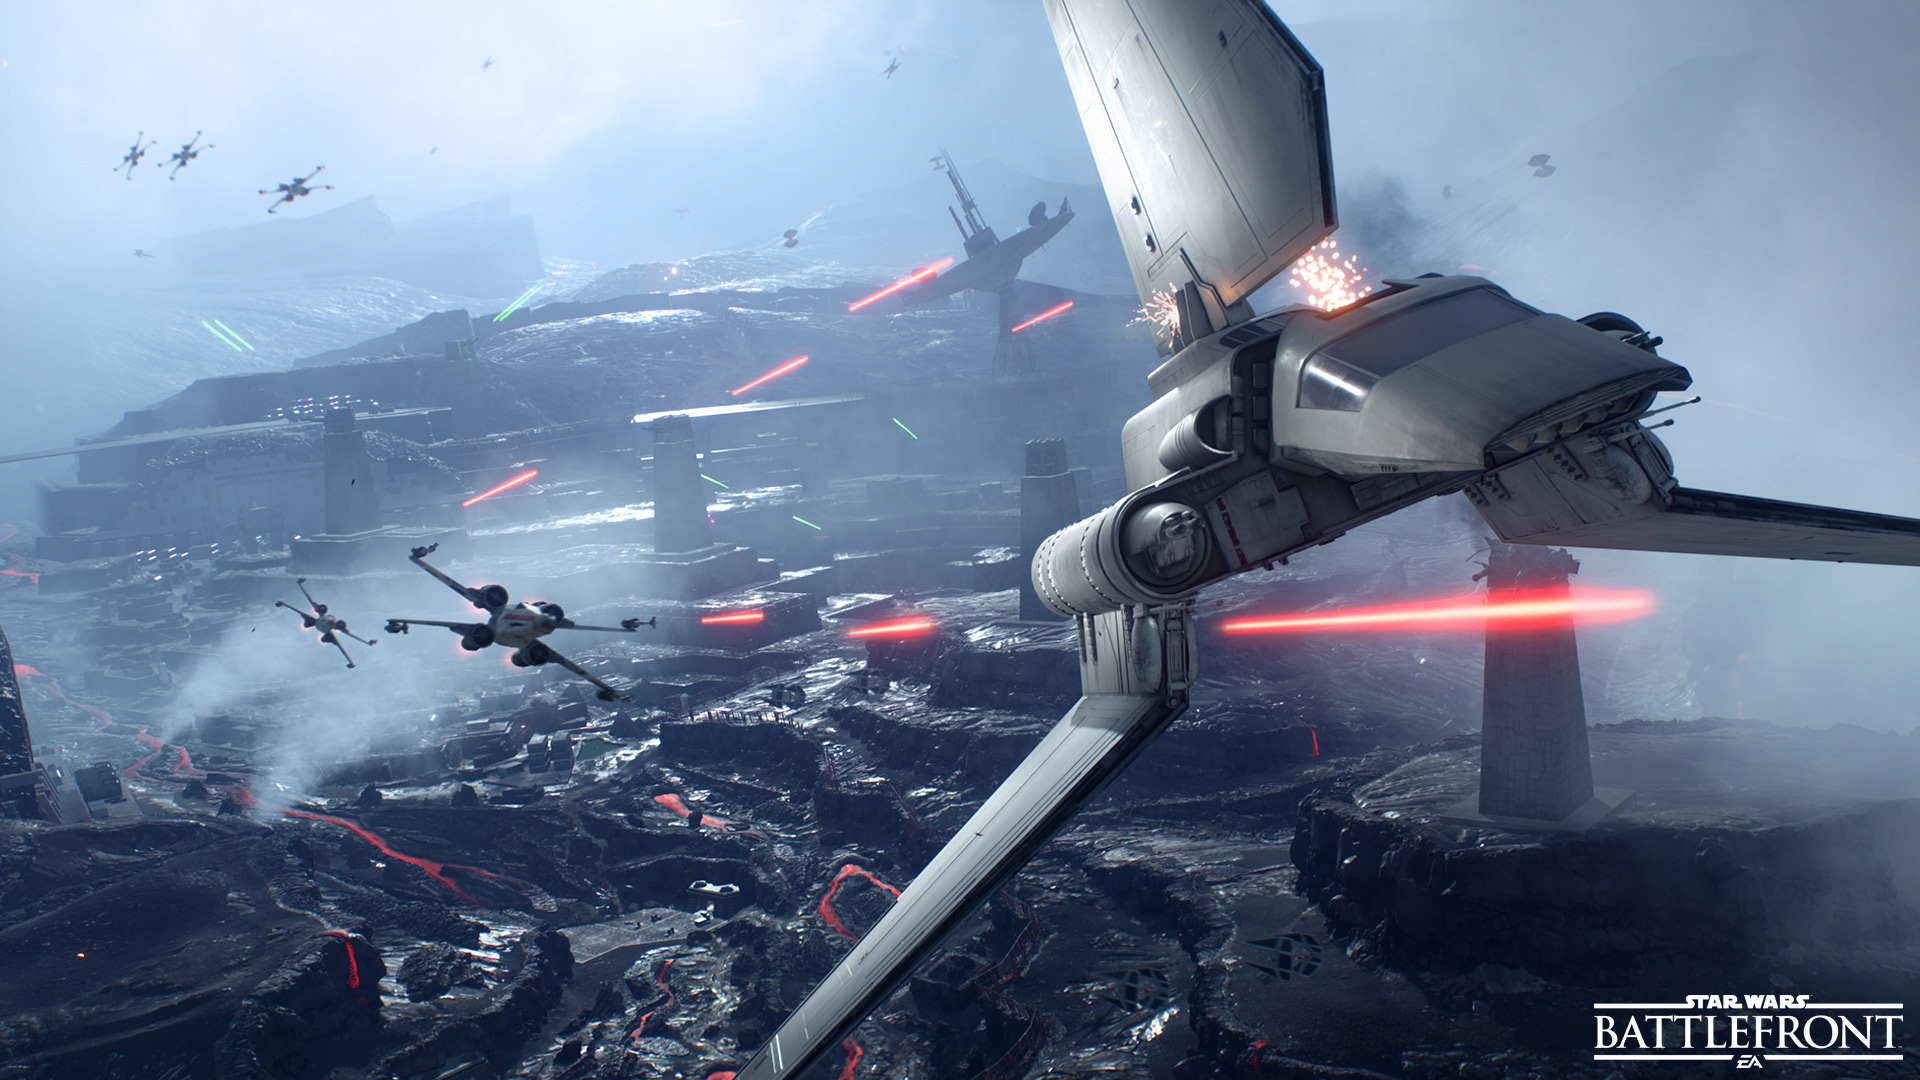 Star wars battlefront free